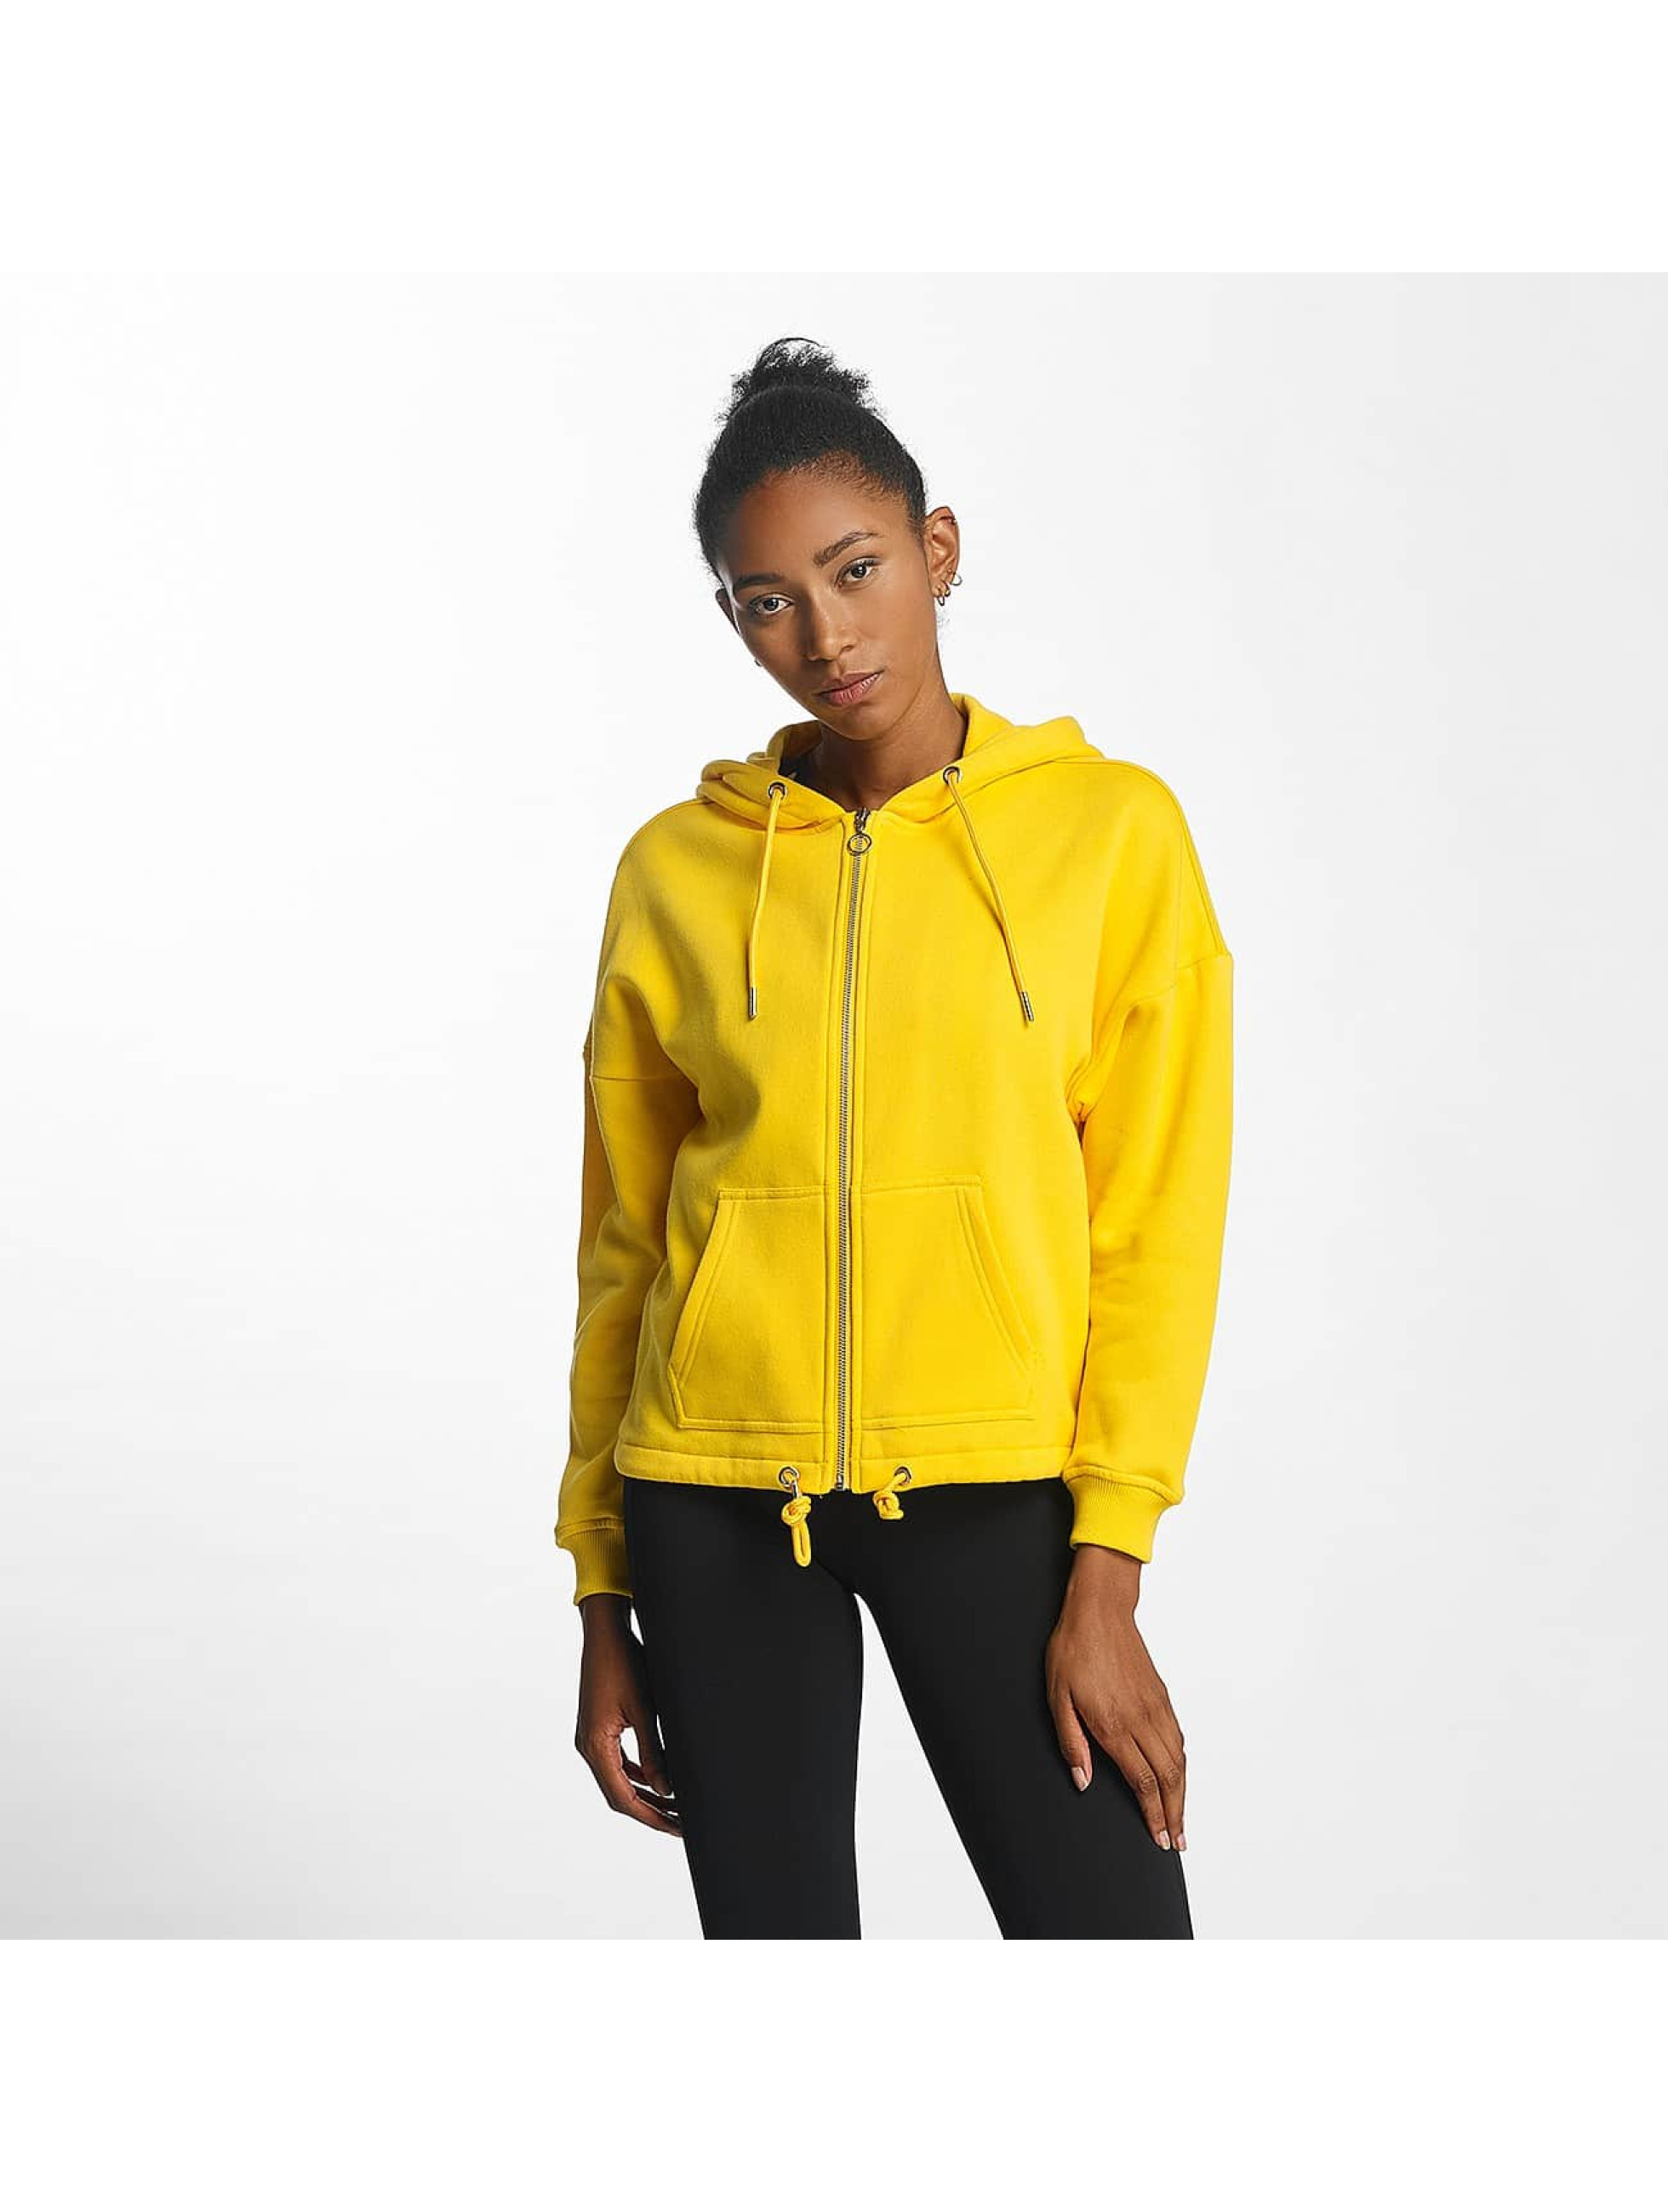 d6830160565 Streetwear tøj tilbud billigste akku boremaskine